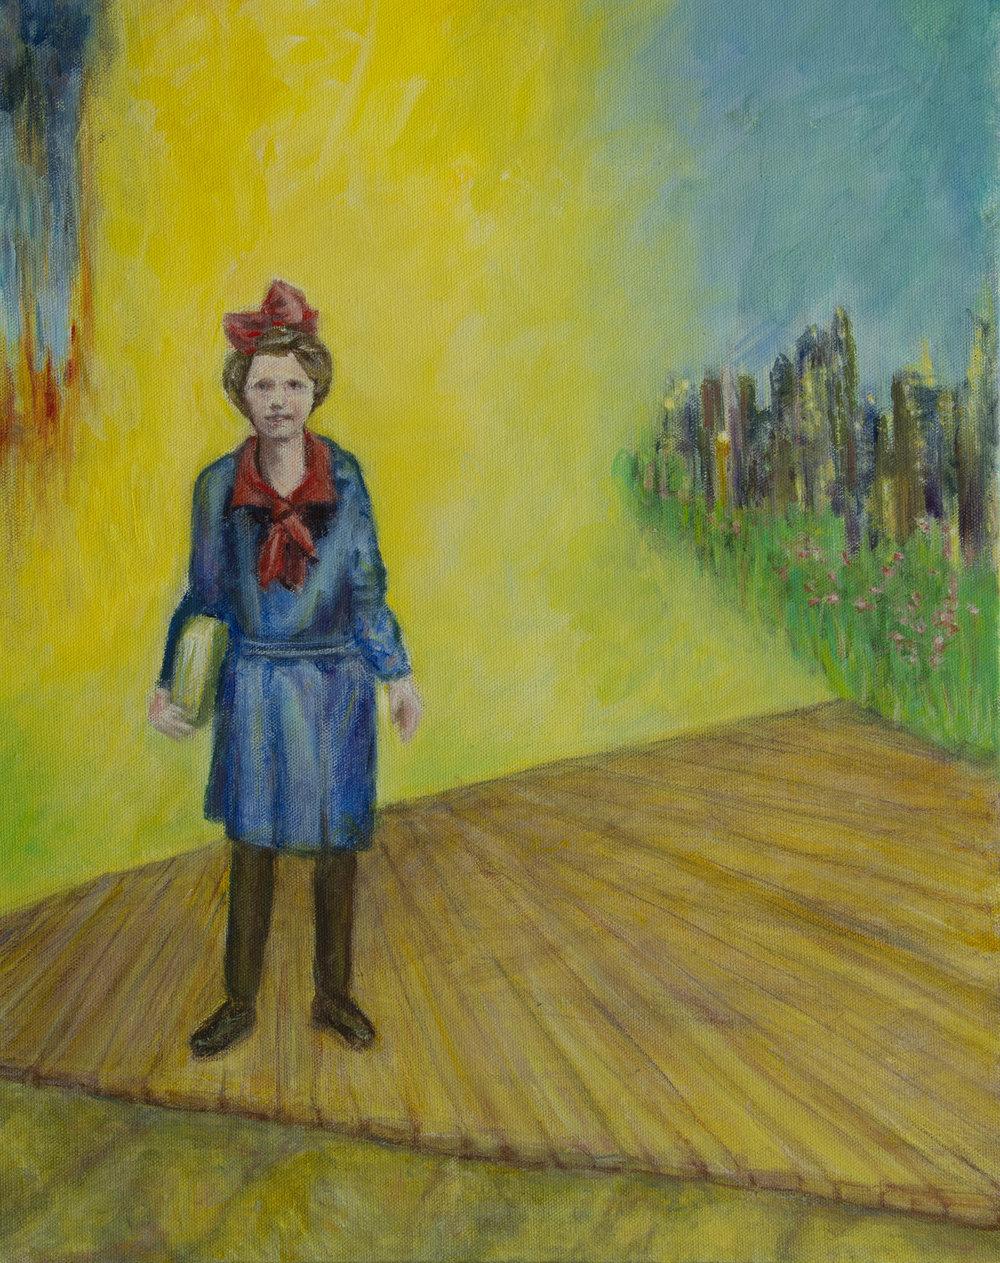 Rae in America, Rachel Lulov Segall acrylic on canvas 2018